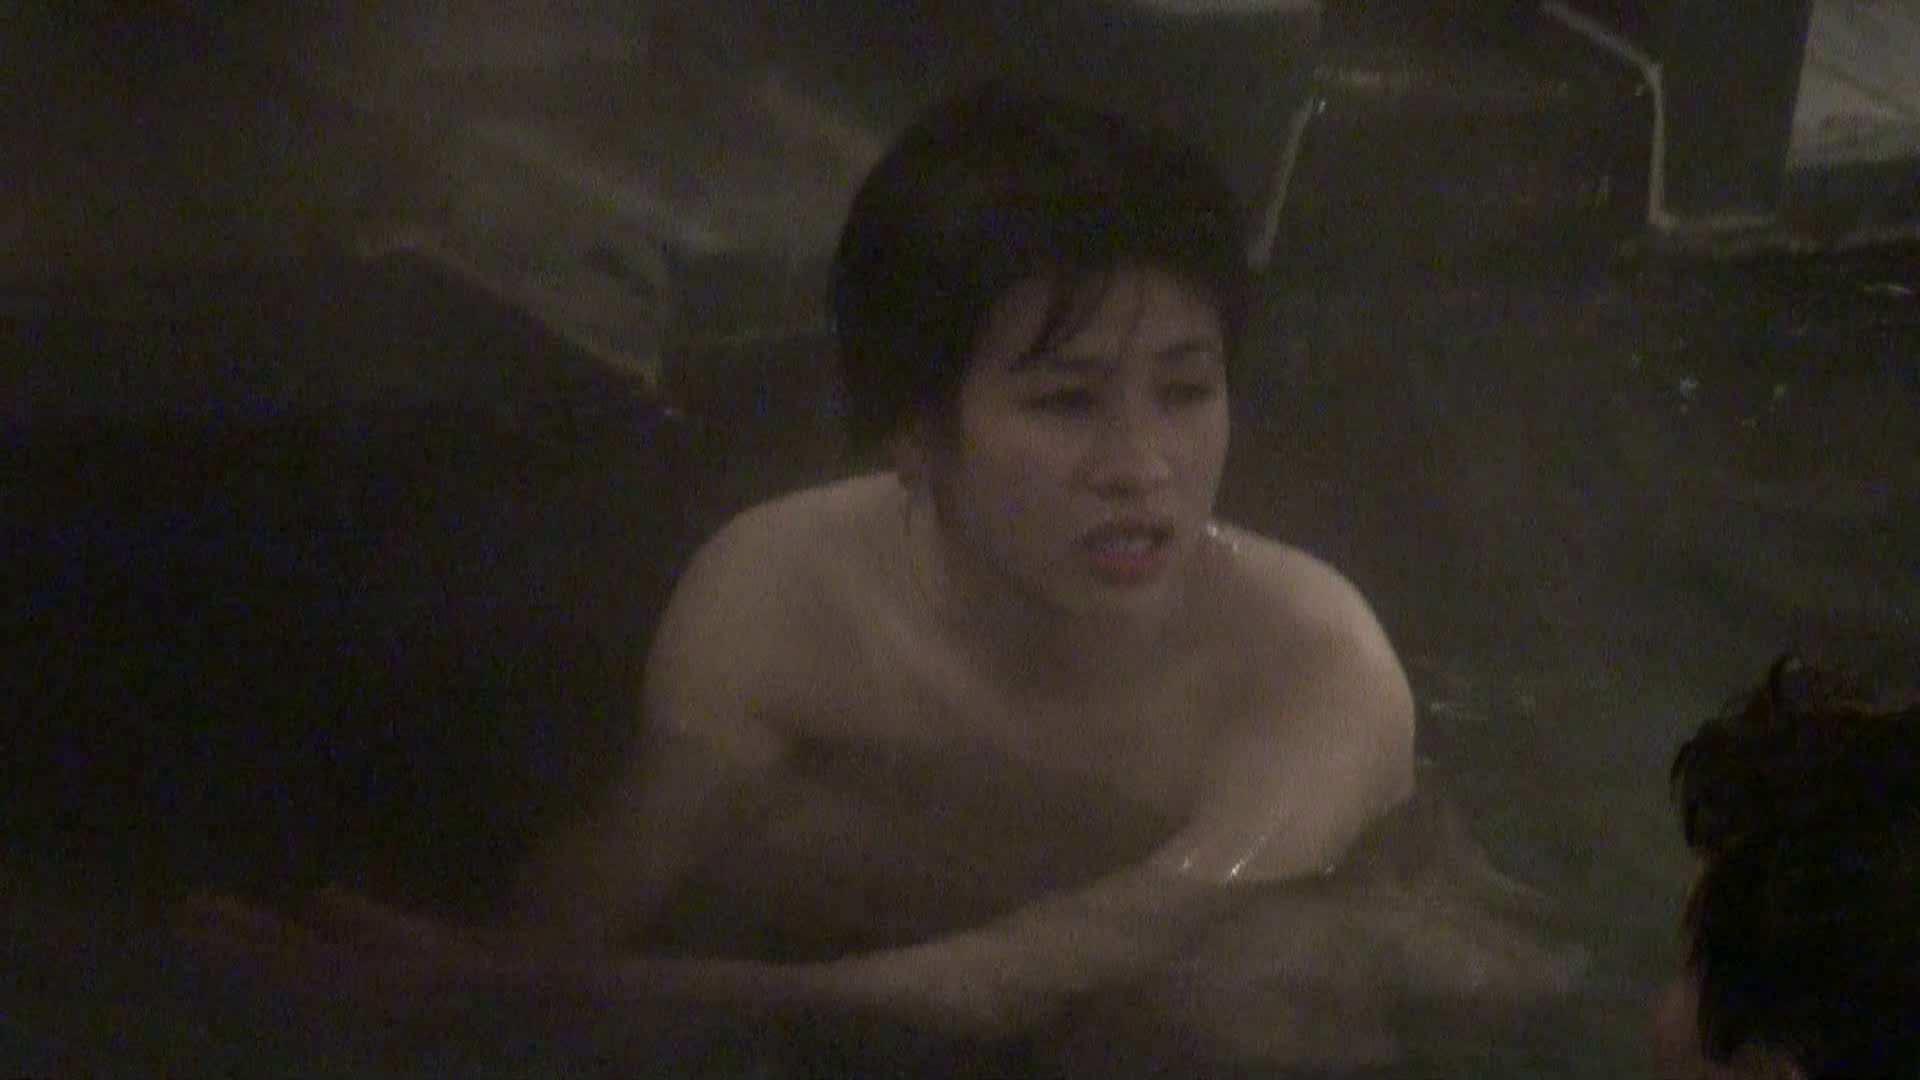 Aquaな露天風呂Vol.438 露天 | OL女体  76連発 70